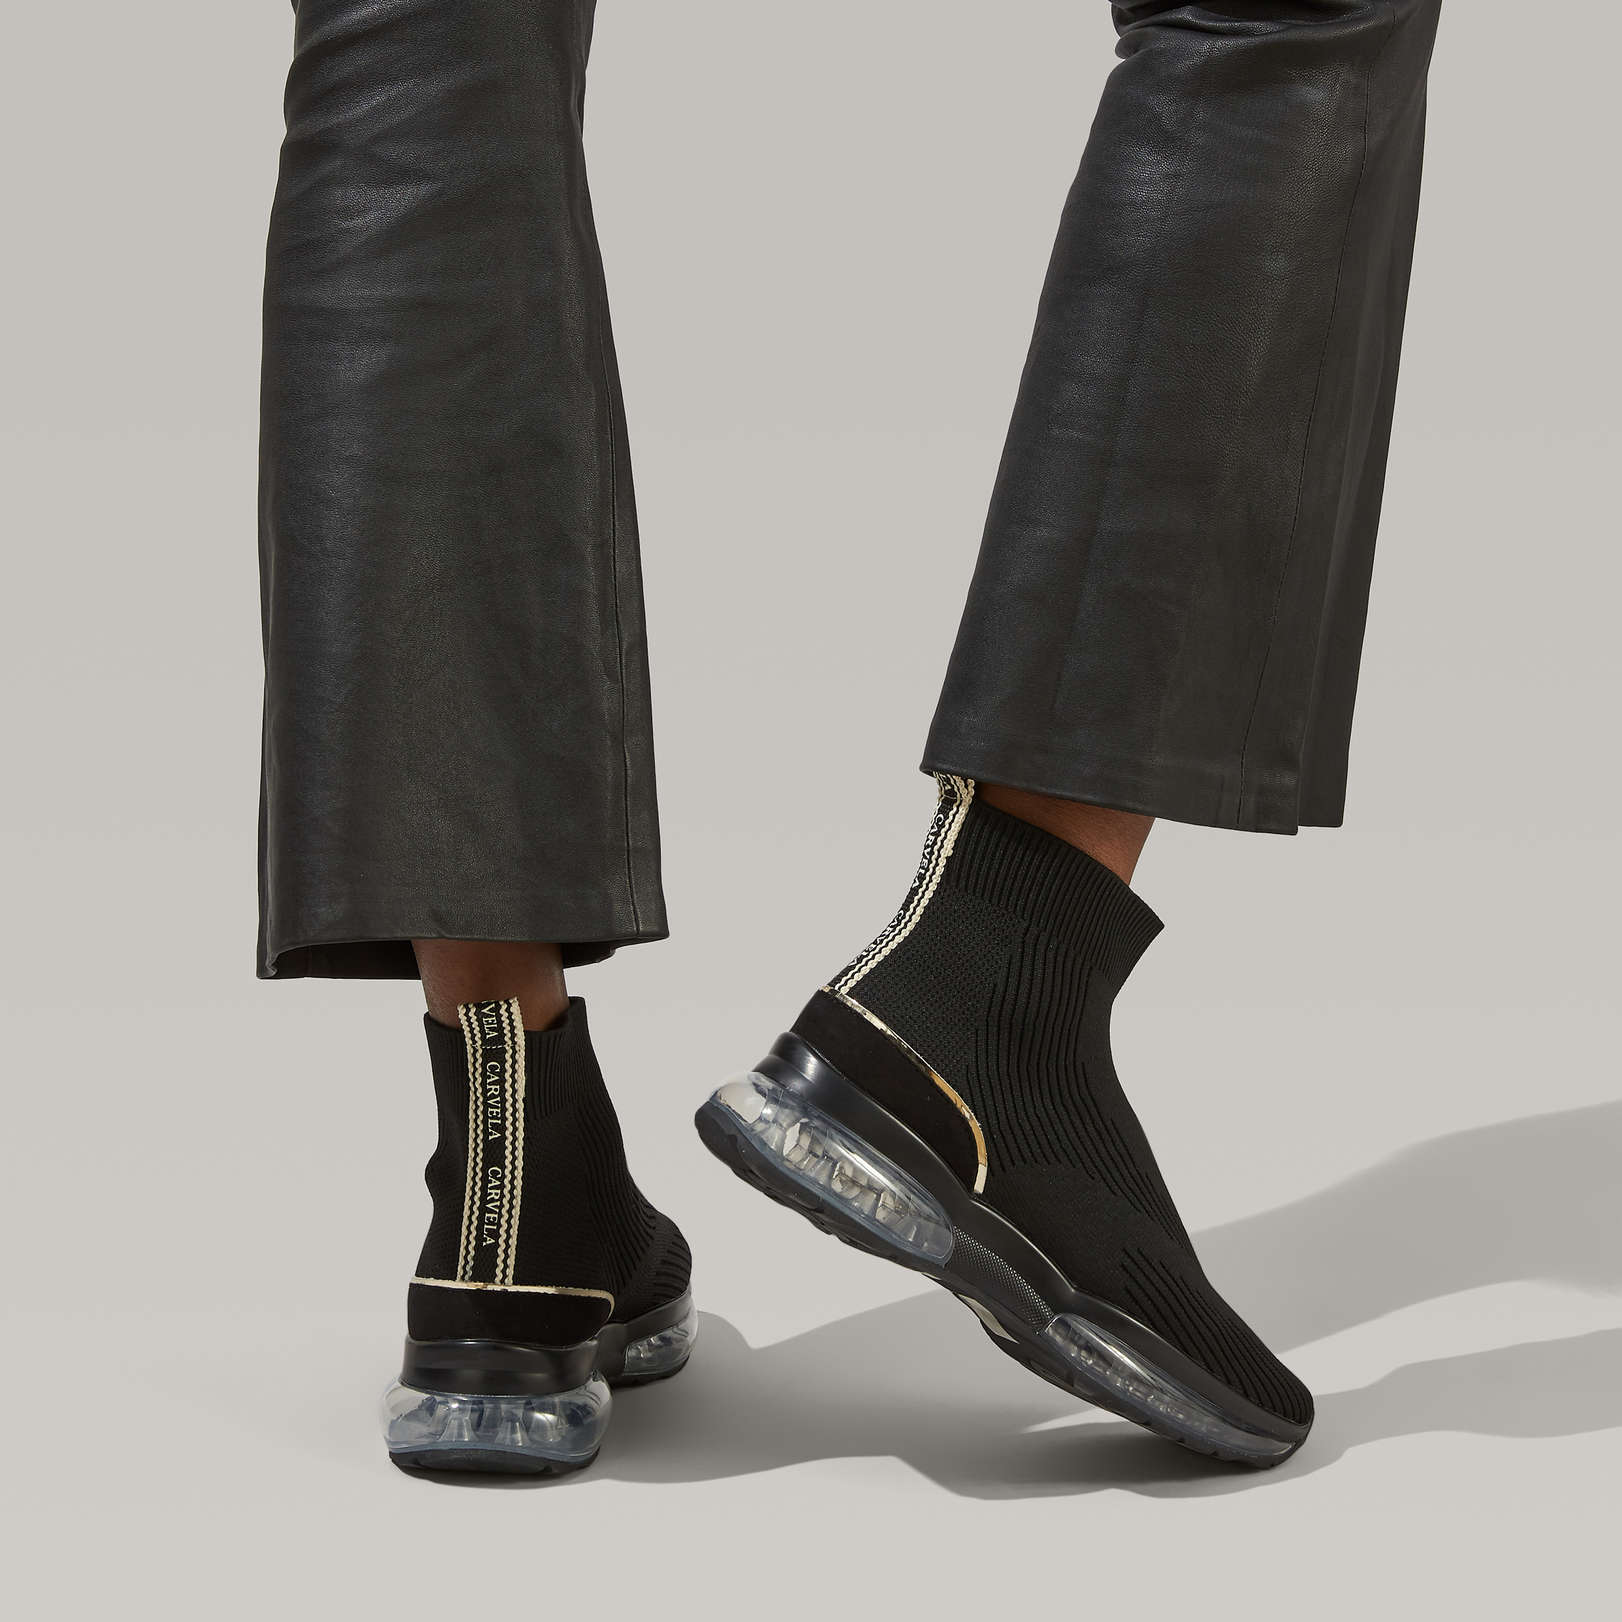 LINK BUBBLE - CARVELA Sneakers